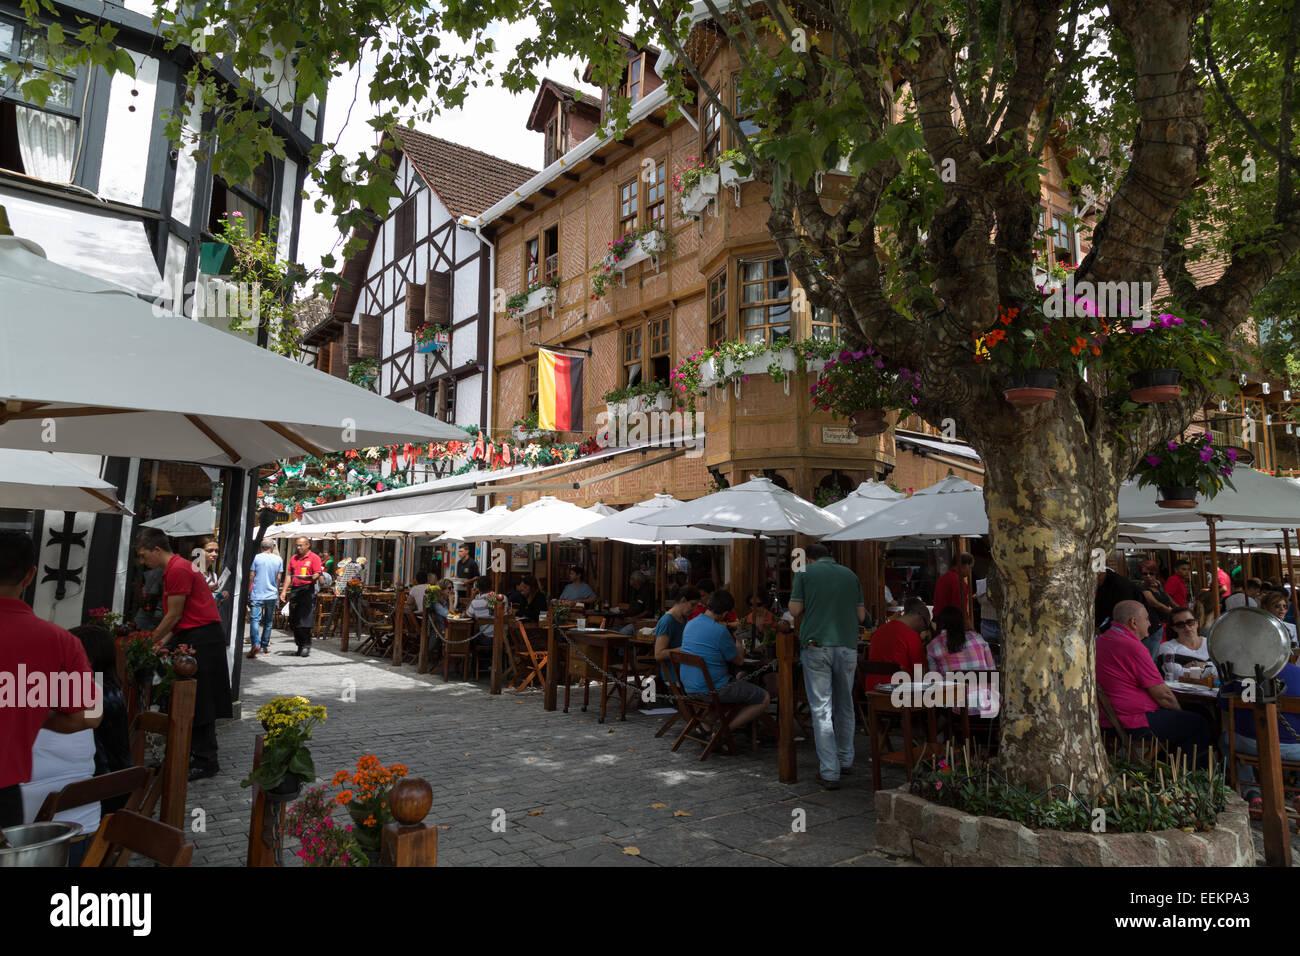 Choperia Baden Baden, outdoor beer bar and restaurant, people enjoying food and drinks, Boulevard Geneve, Capivari, - Stock Image